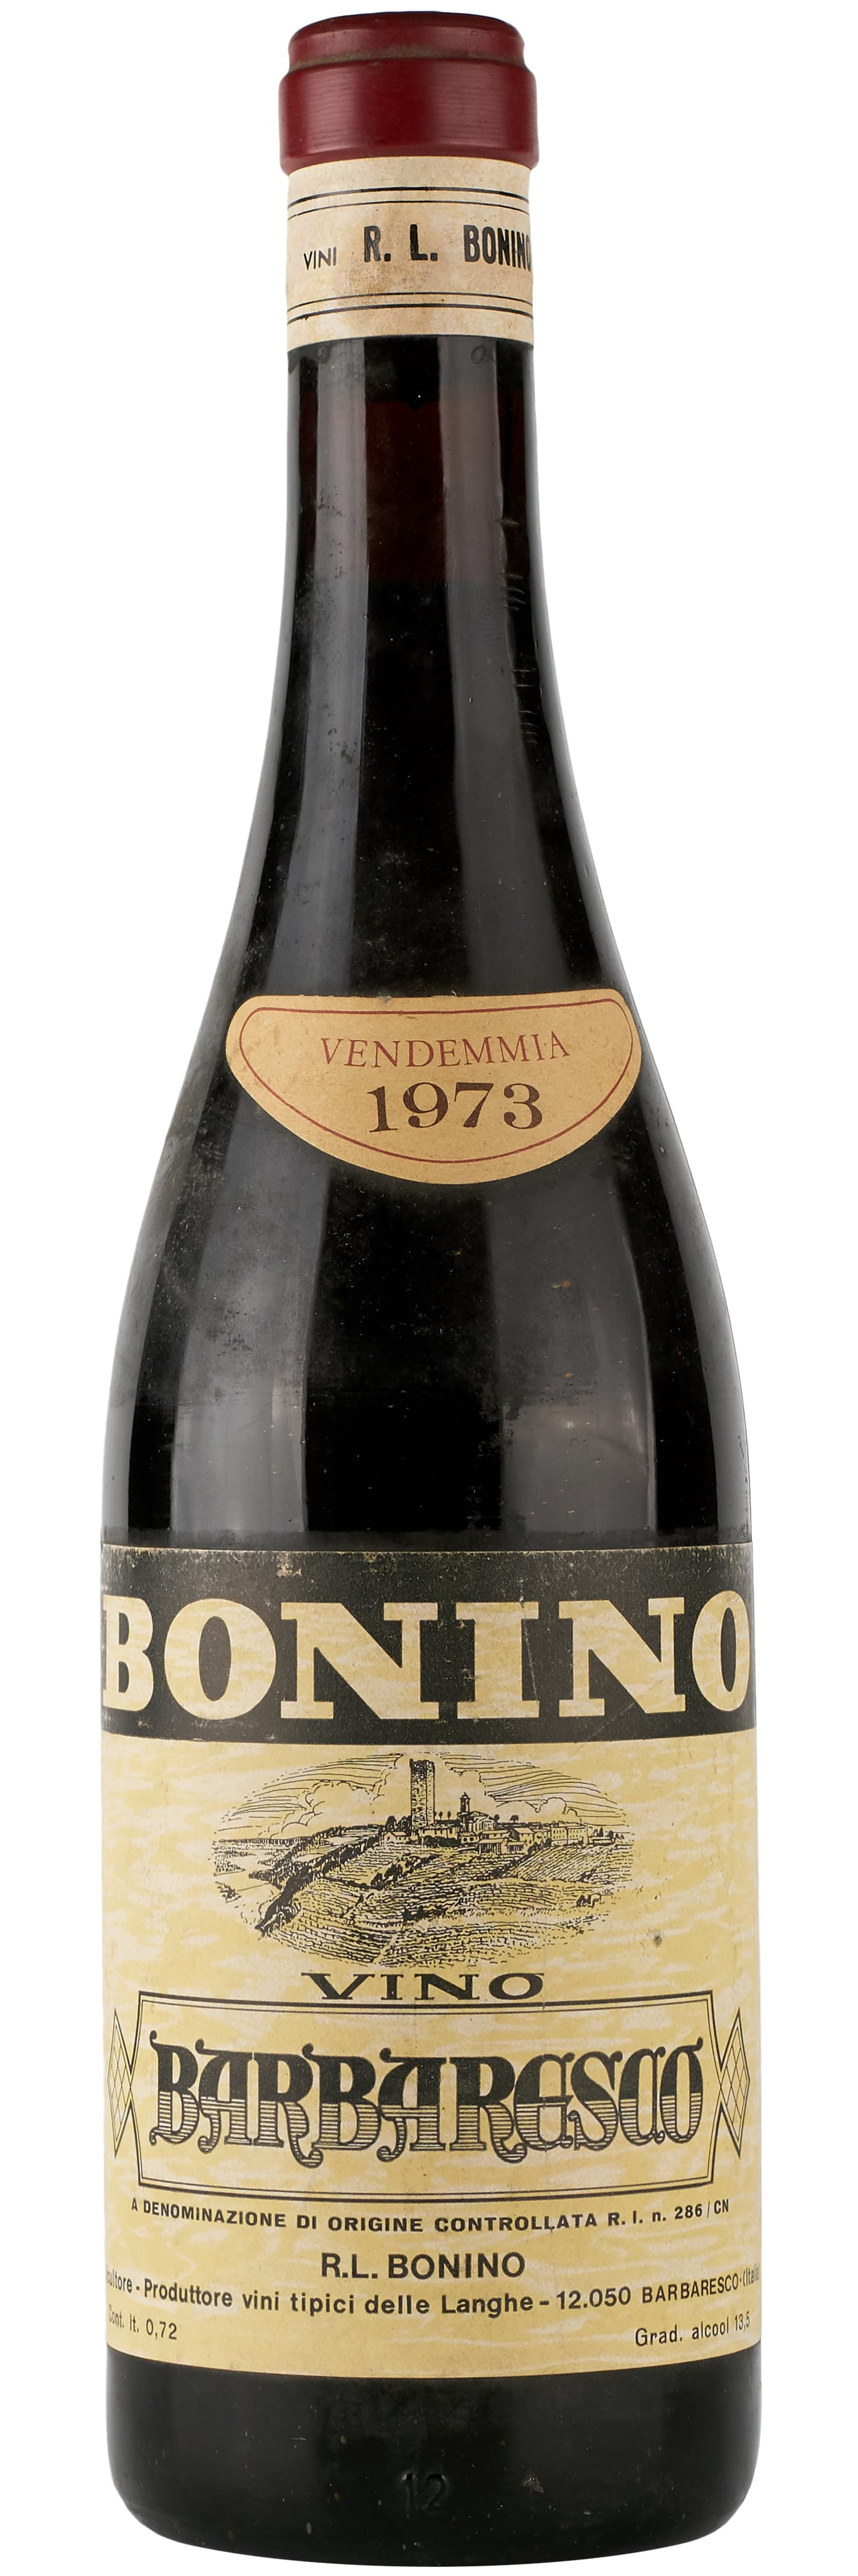 1973 Bonino Barbaresco фото